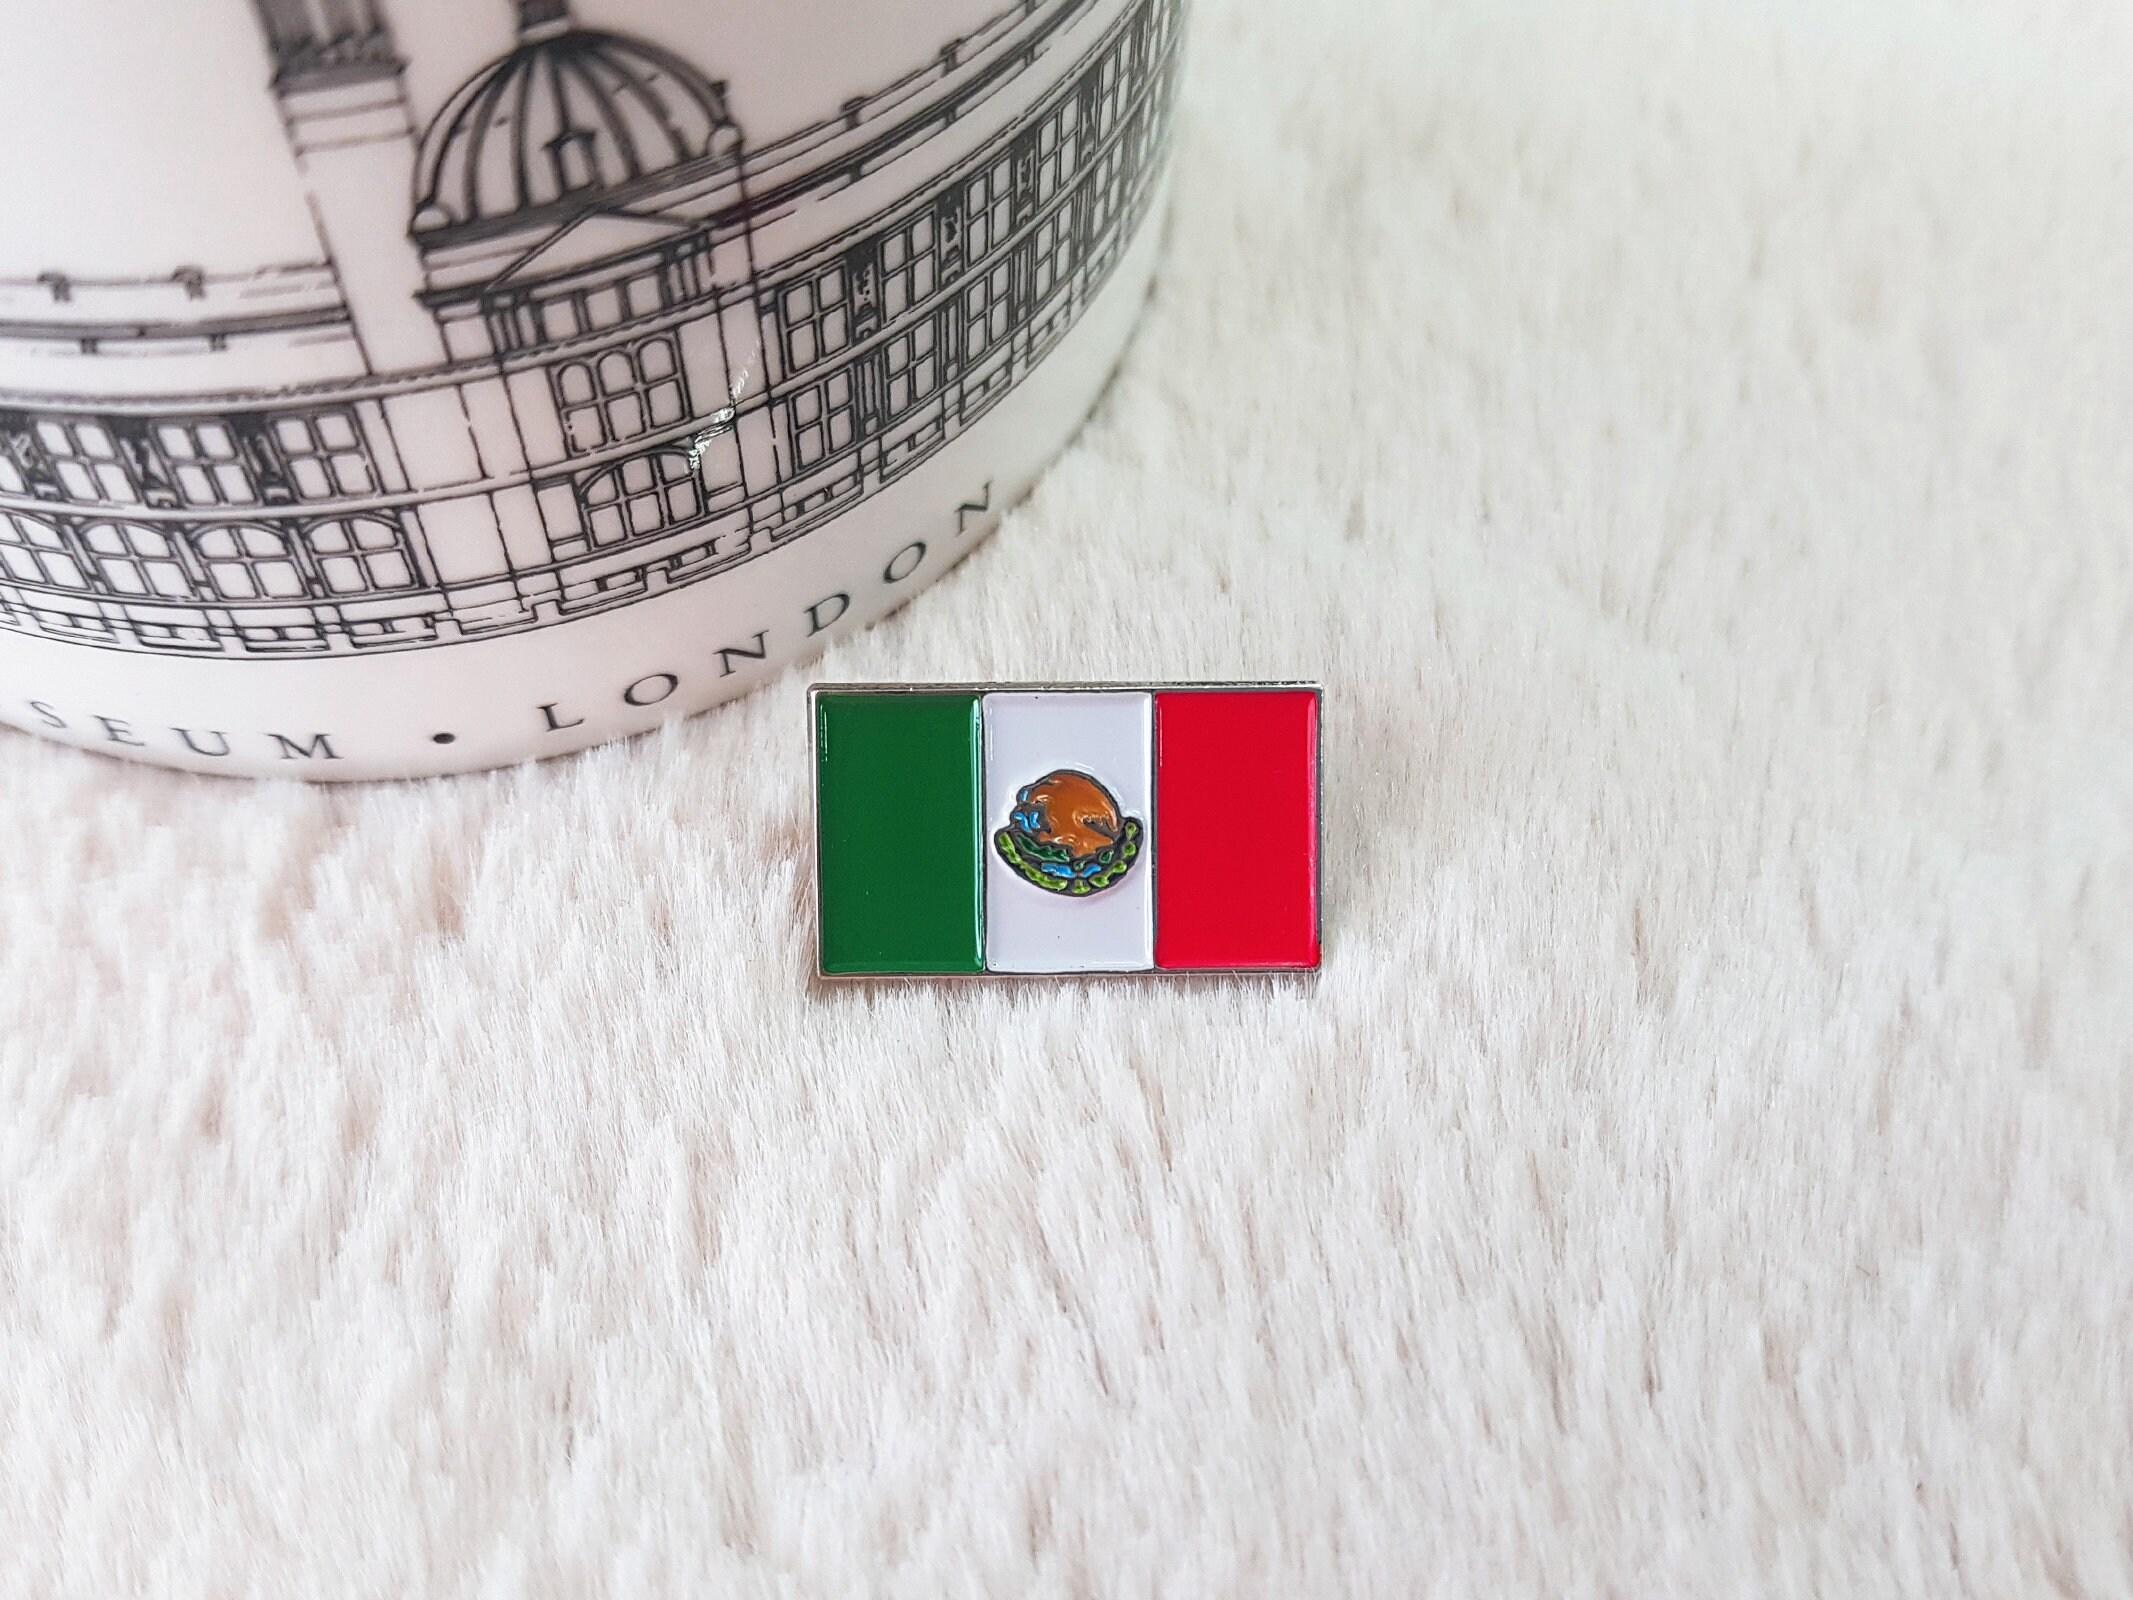 pins pin/'s flag national badge metal lapel backpack hat button vest uzbekistan